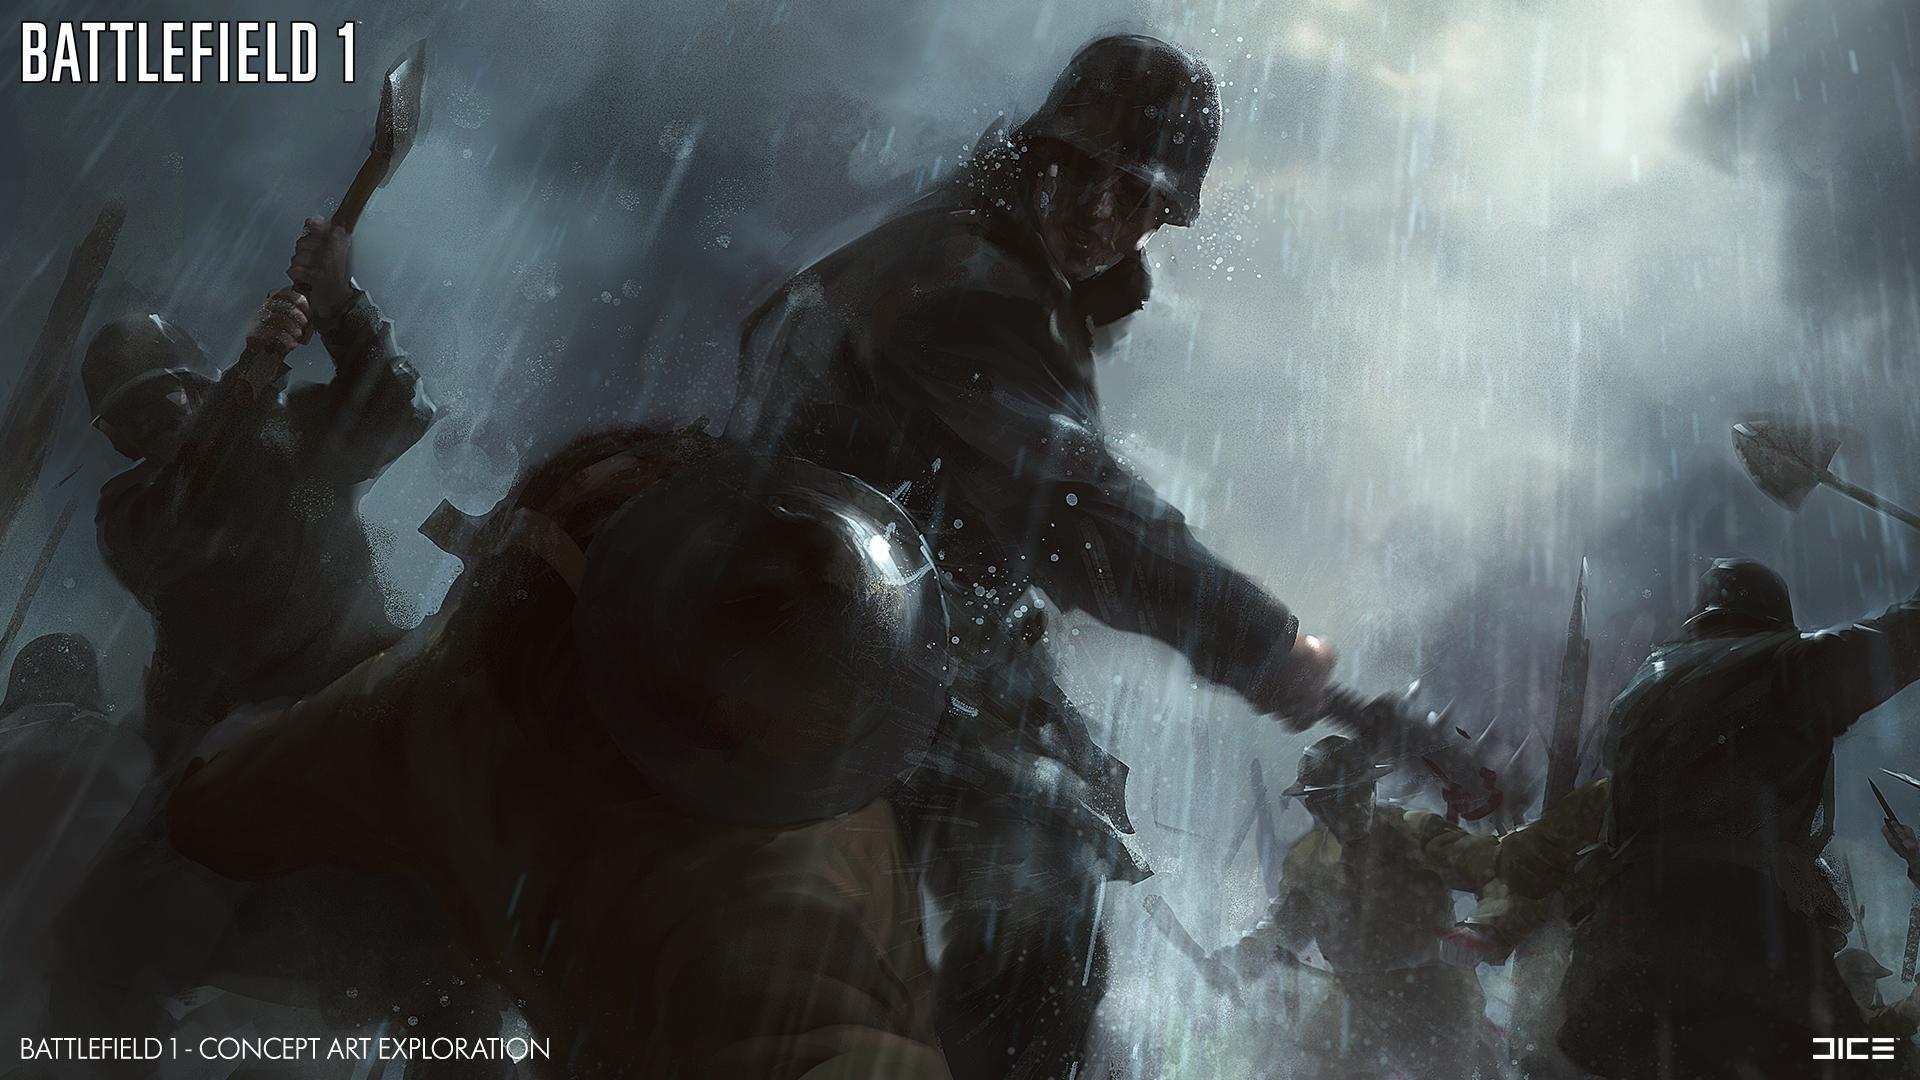 Battlefield 1 – TV Serie in Arbeit